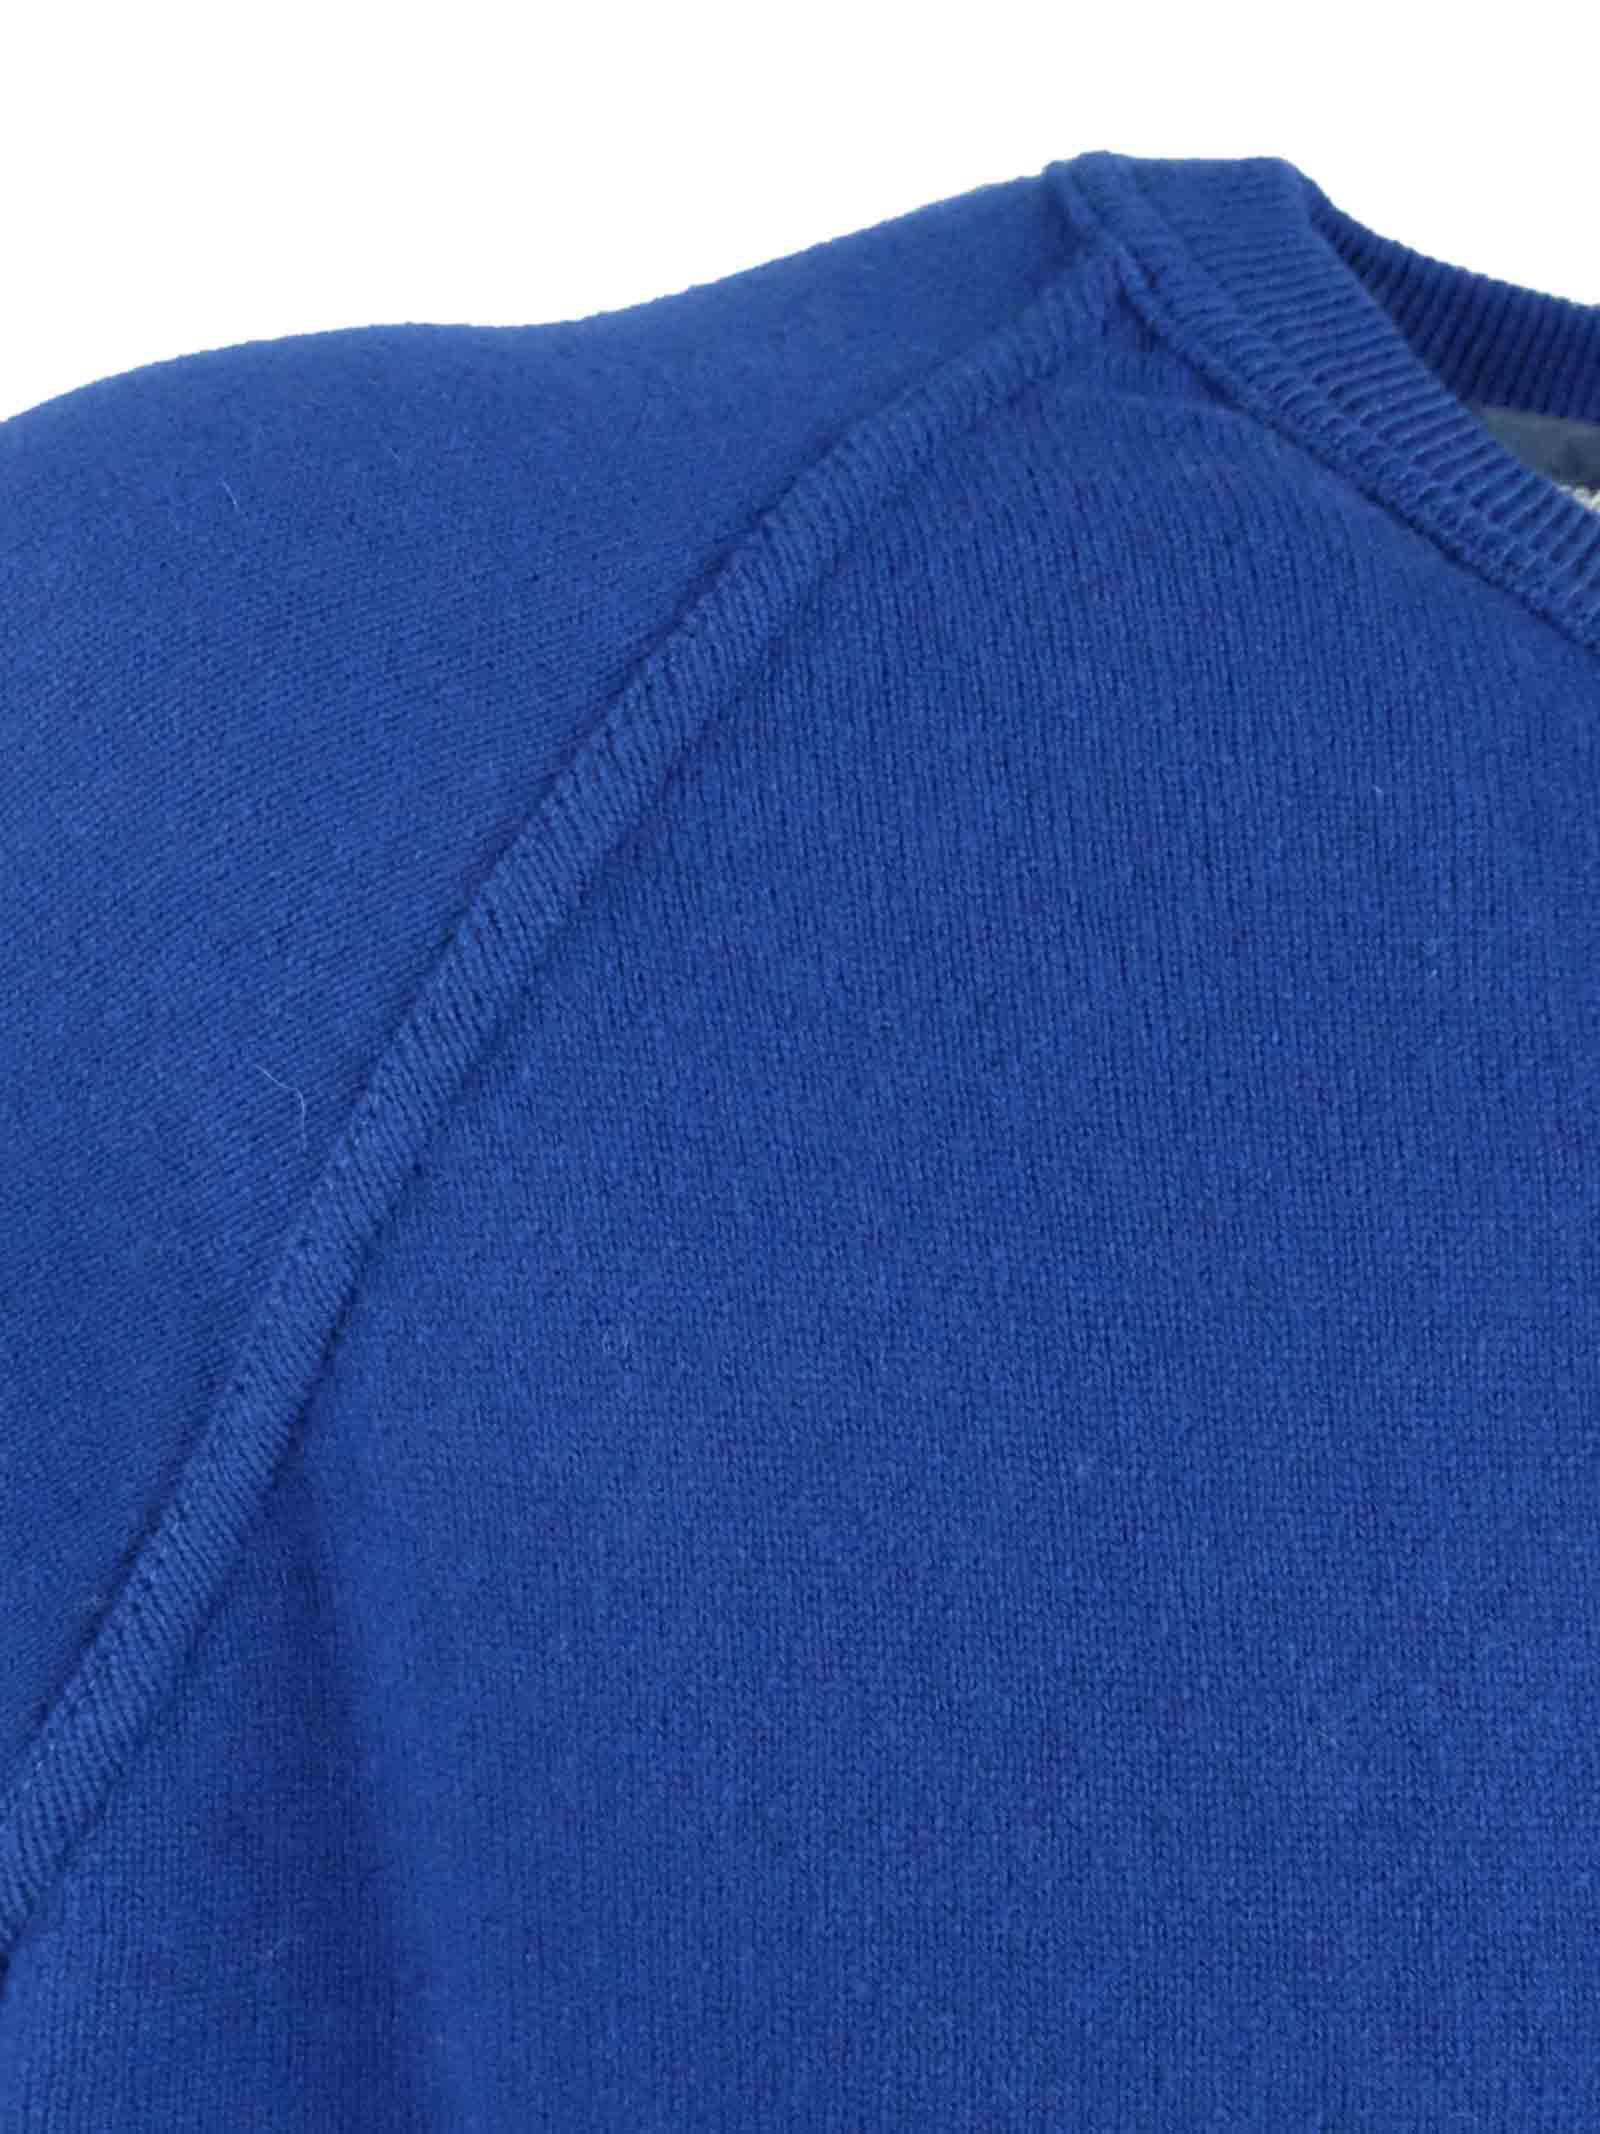 DRUMOHR | Knitwear | D1K200782